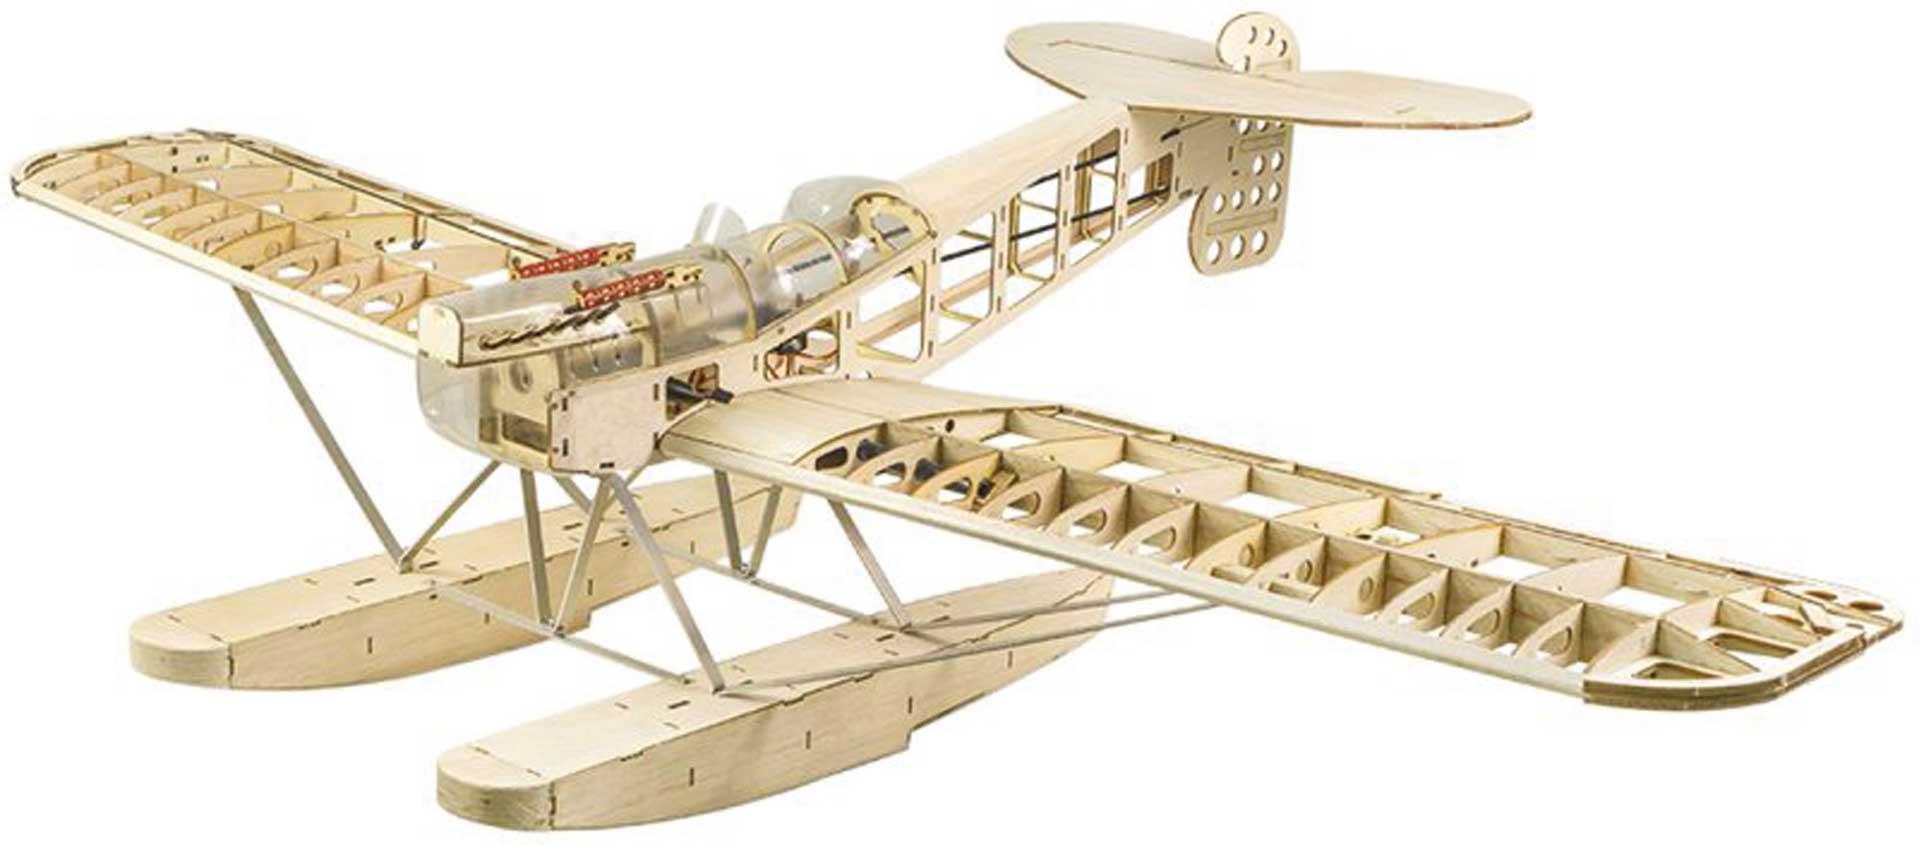 Pichler Hansa Brandenburg W 29 1400mm Wooden construction kit